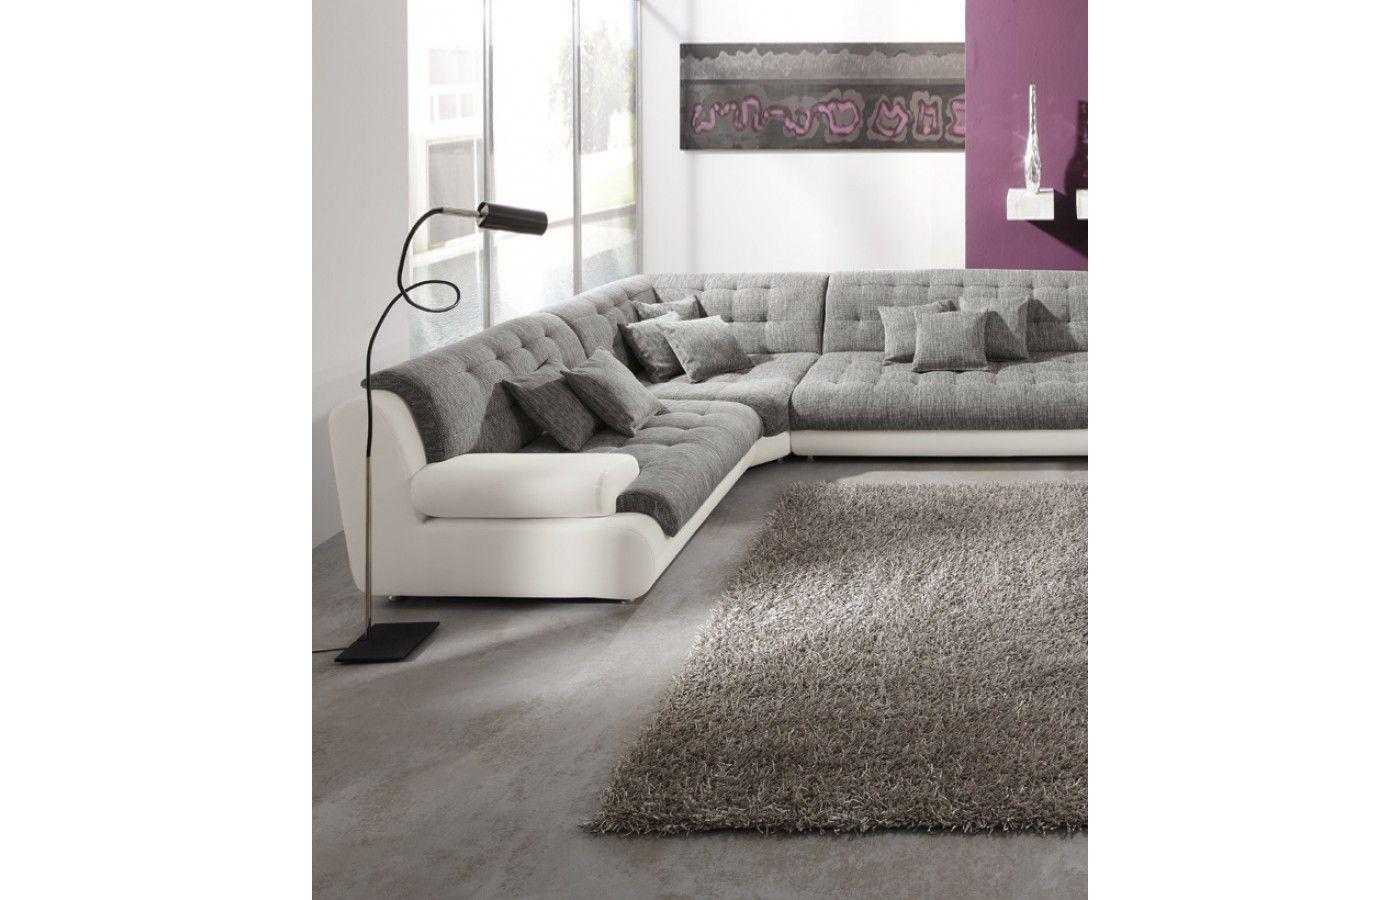 Exklusiv Sofa materialmix wohnlandschaft leder stoff chillout two exklusiv